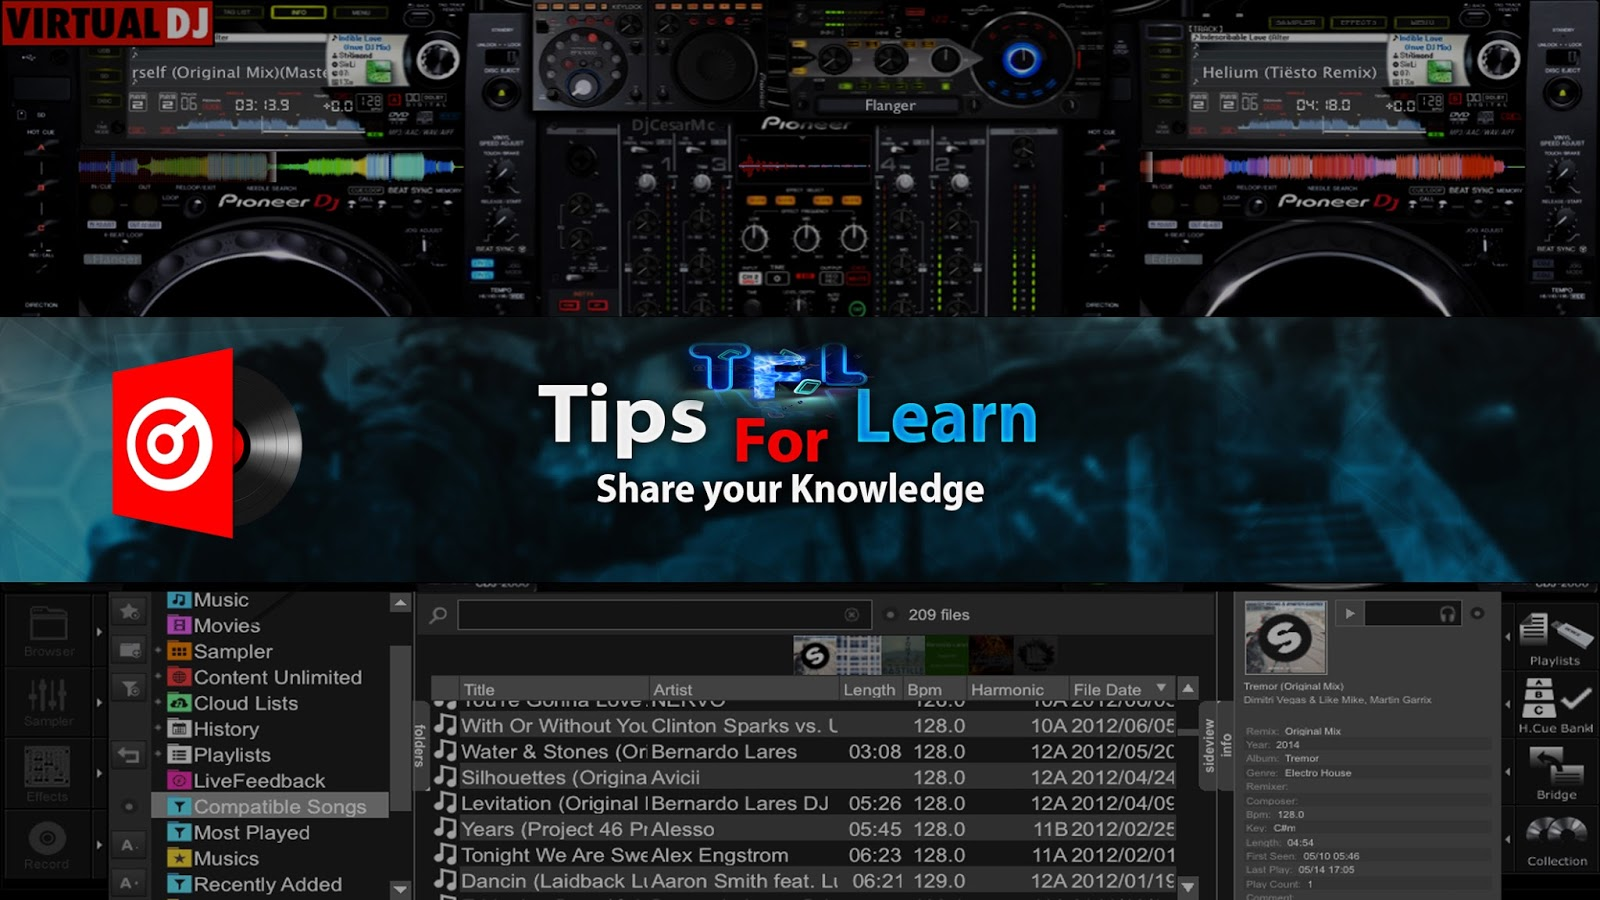 Virtual dj 8 crack software download free